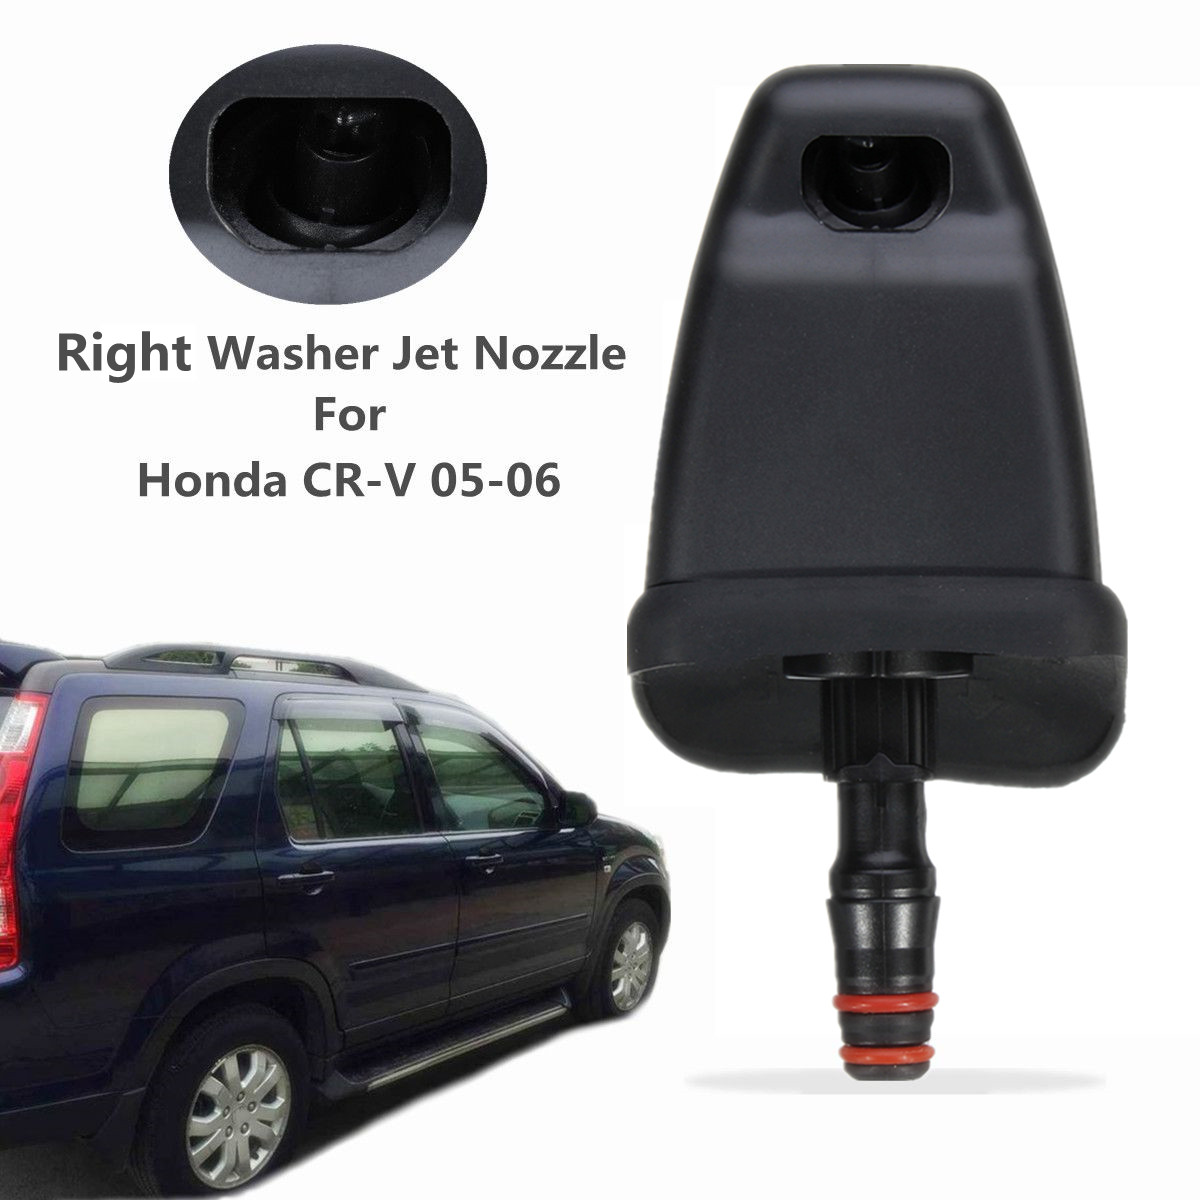 1Pc Right Headlight Washer Spray Jet Nozzle Fit For Honda CRV 2005-2006 76880-SCA-S11